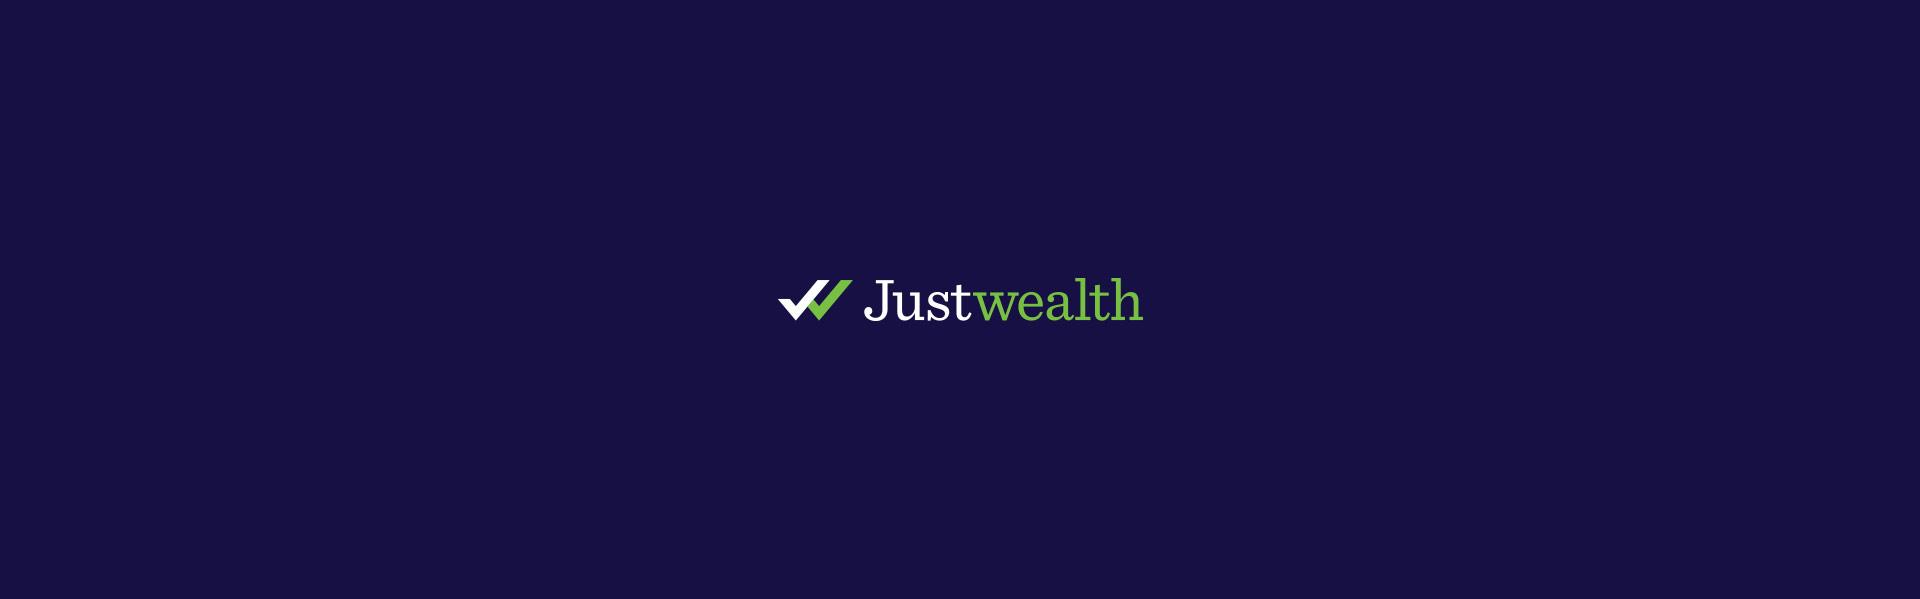 Justwealth Logo Design